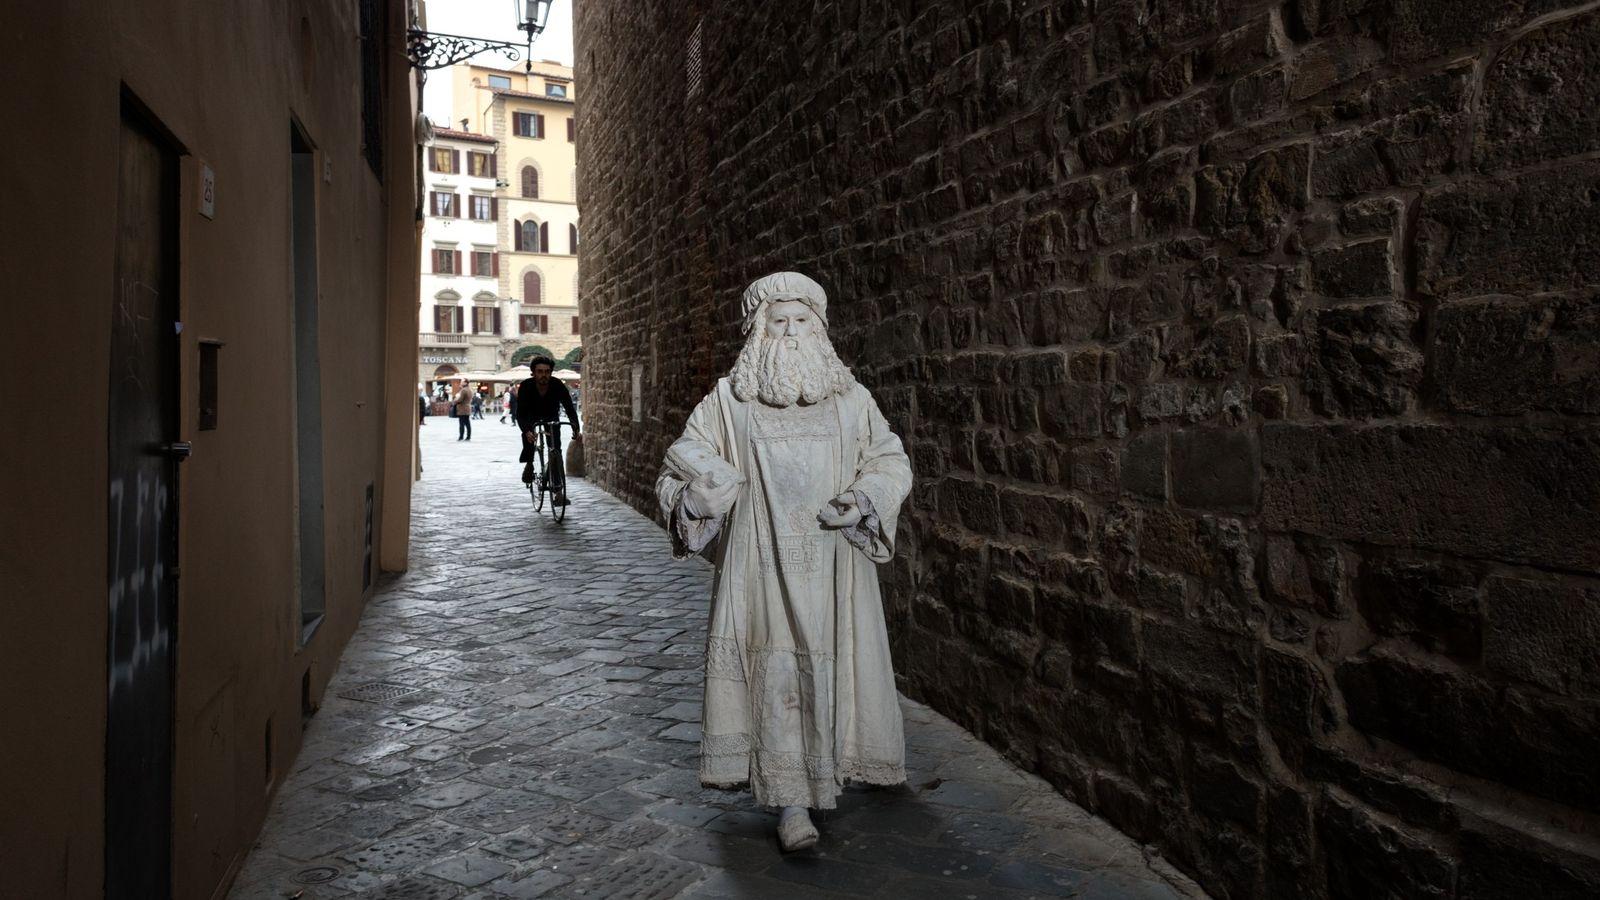 Valter Conti, strolling through one of Florence's narrow alleyways, began posing as Leonardo da Vinci in ...